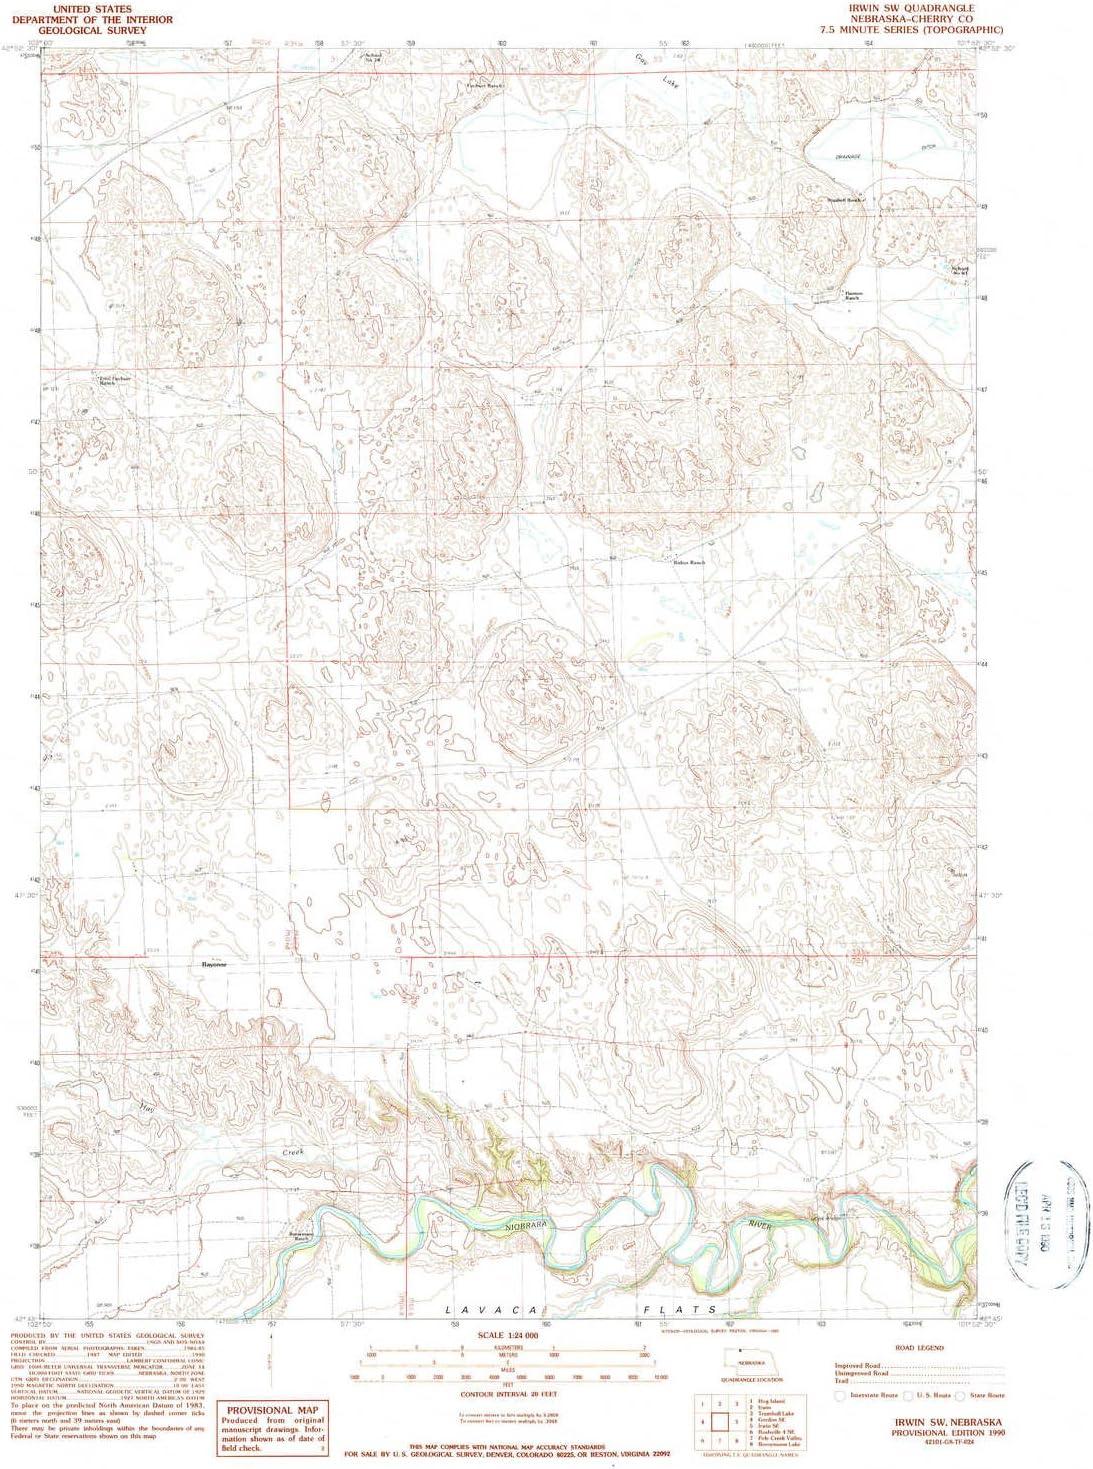 YellowMaps Award Irwin SW NE Wholesale topo map X Minute 1:24000 7.5 Scale